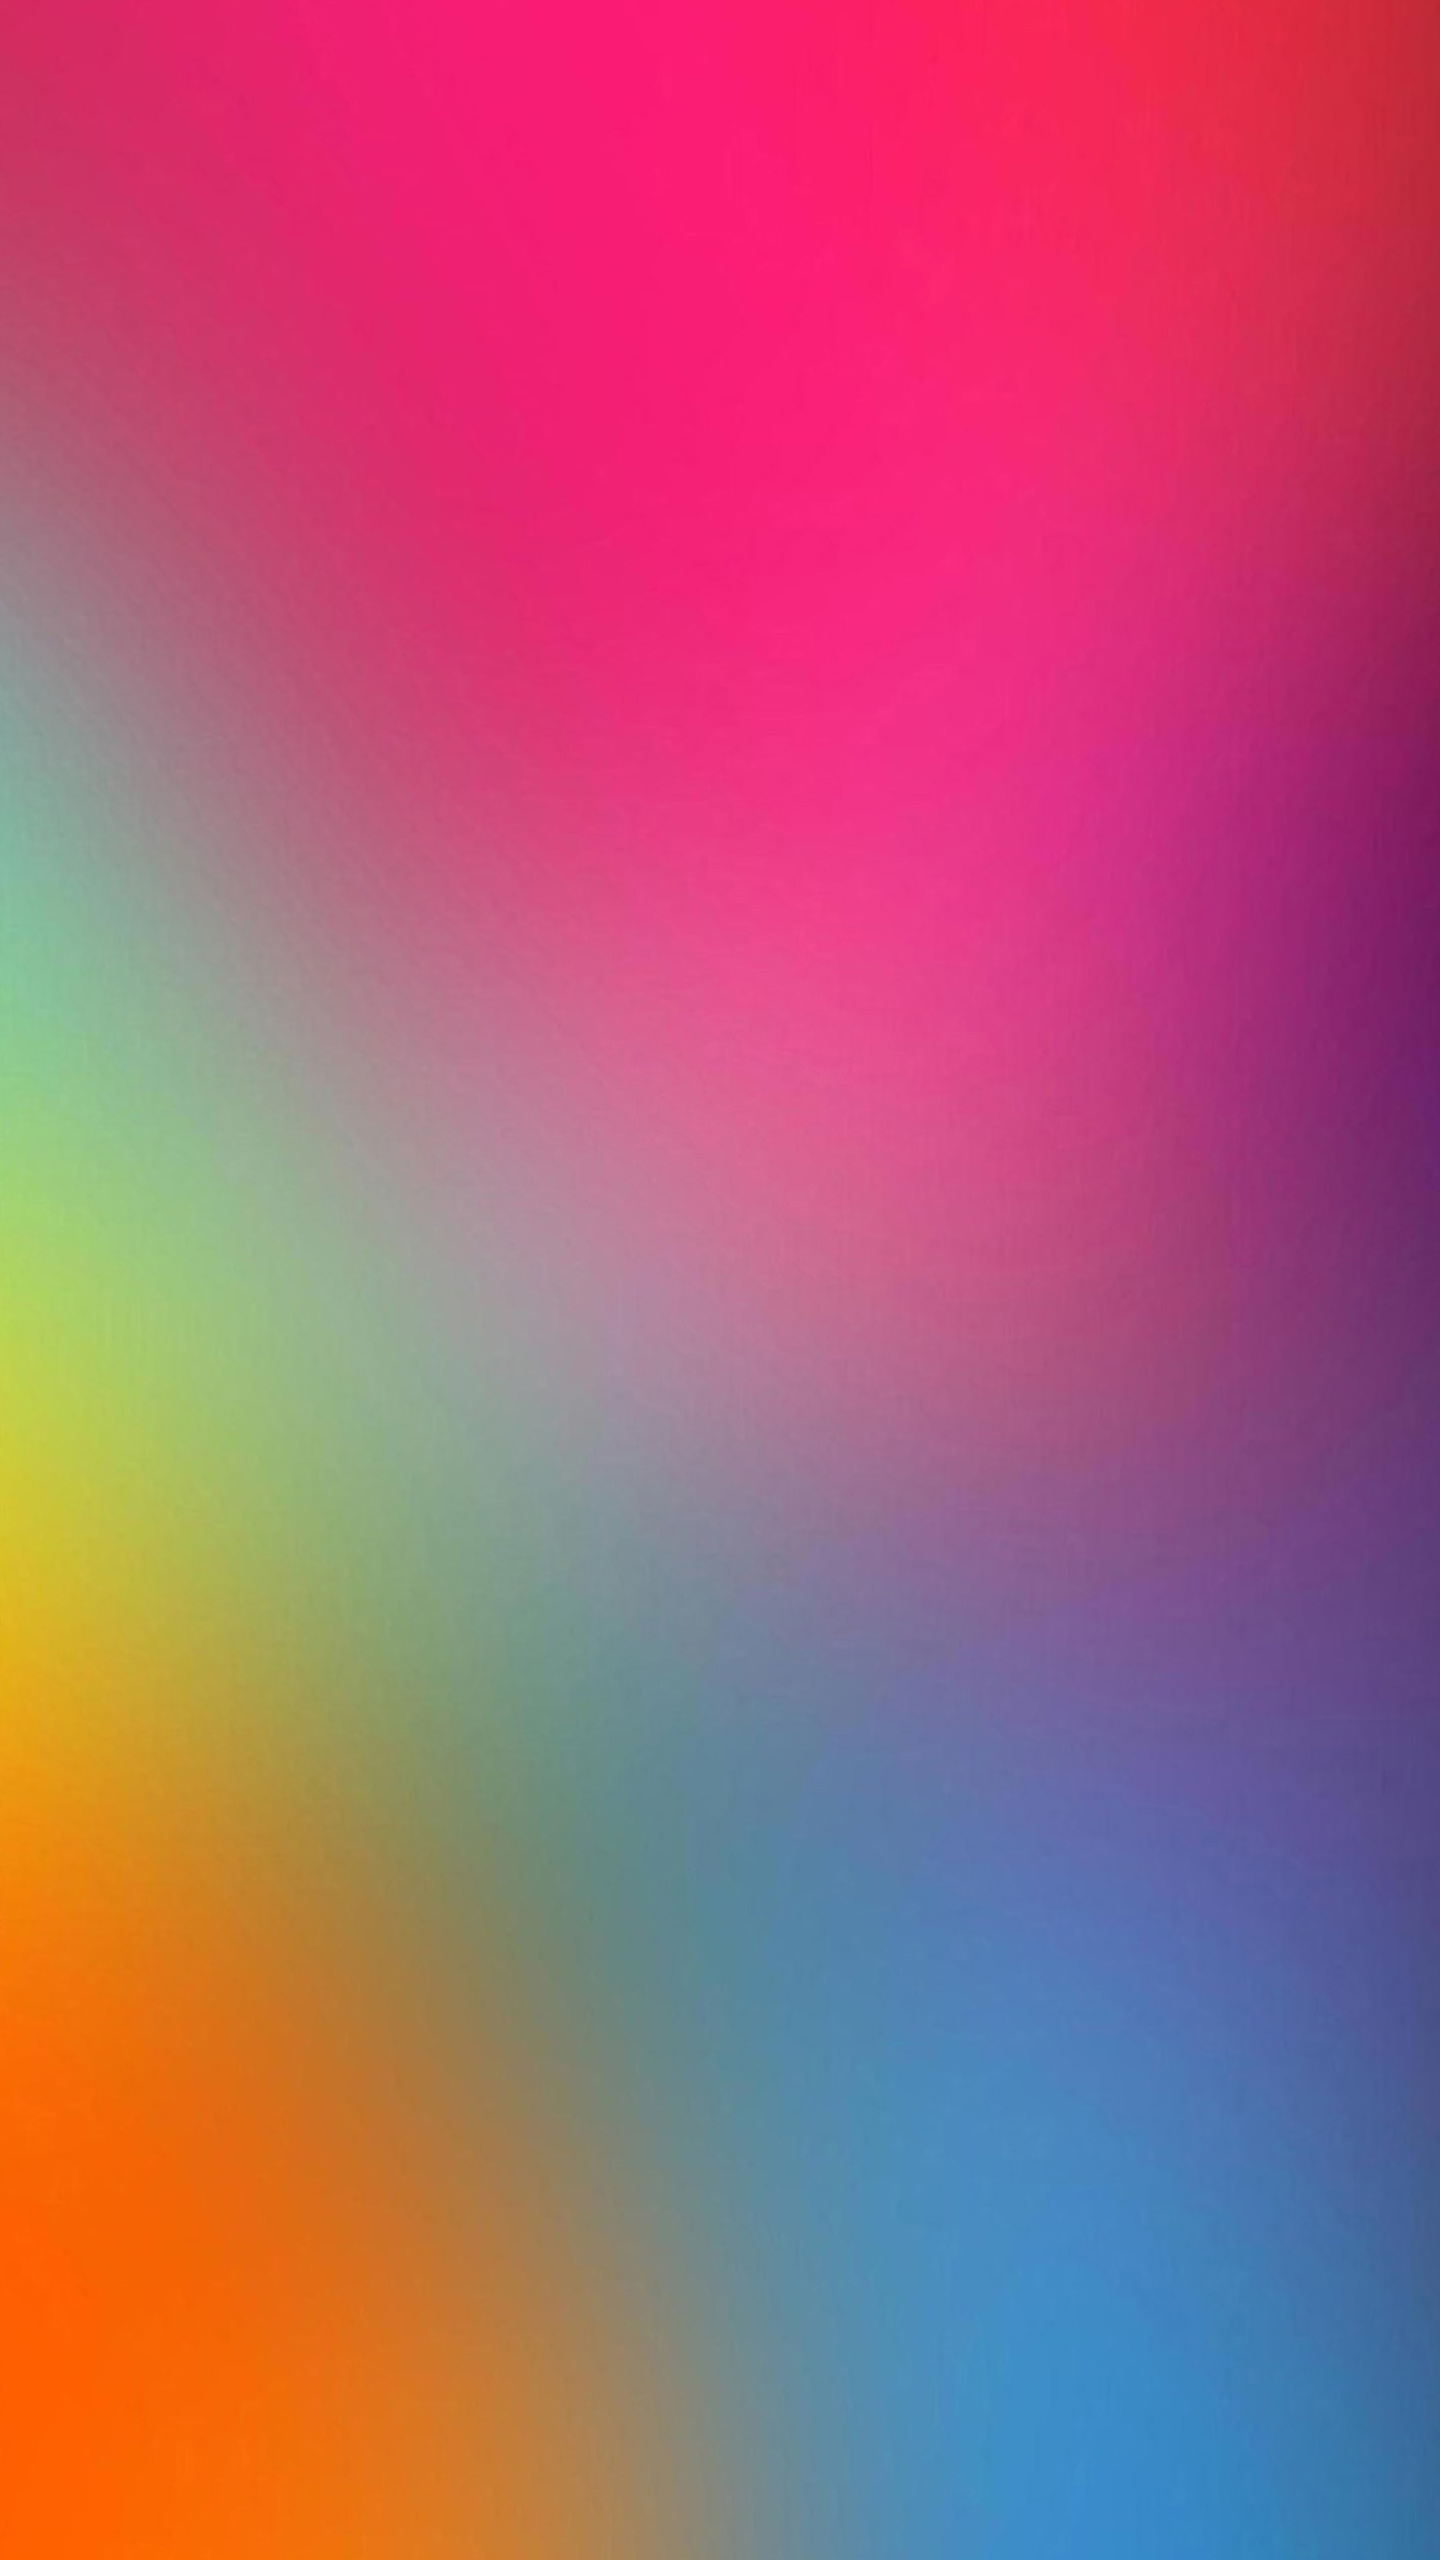 Virtual background 3 LG G4 Wallpapers LG G4 Wallpaper 1440x2560